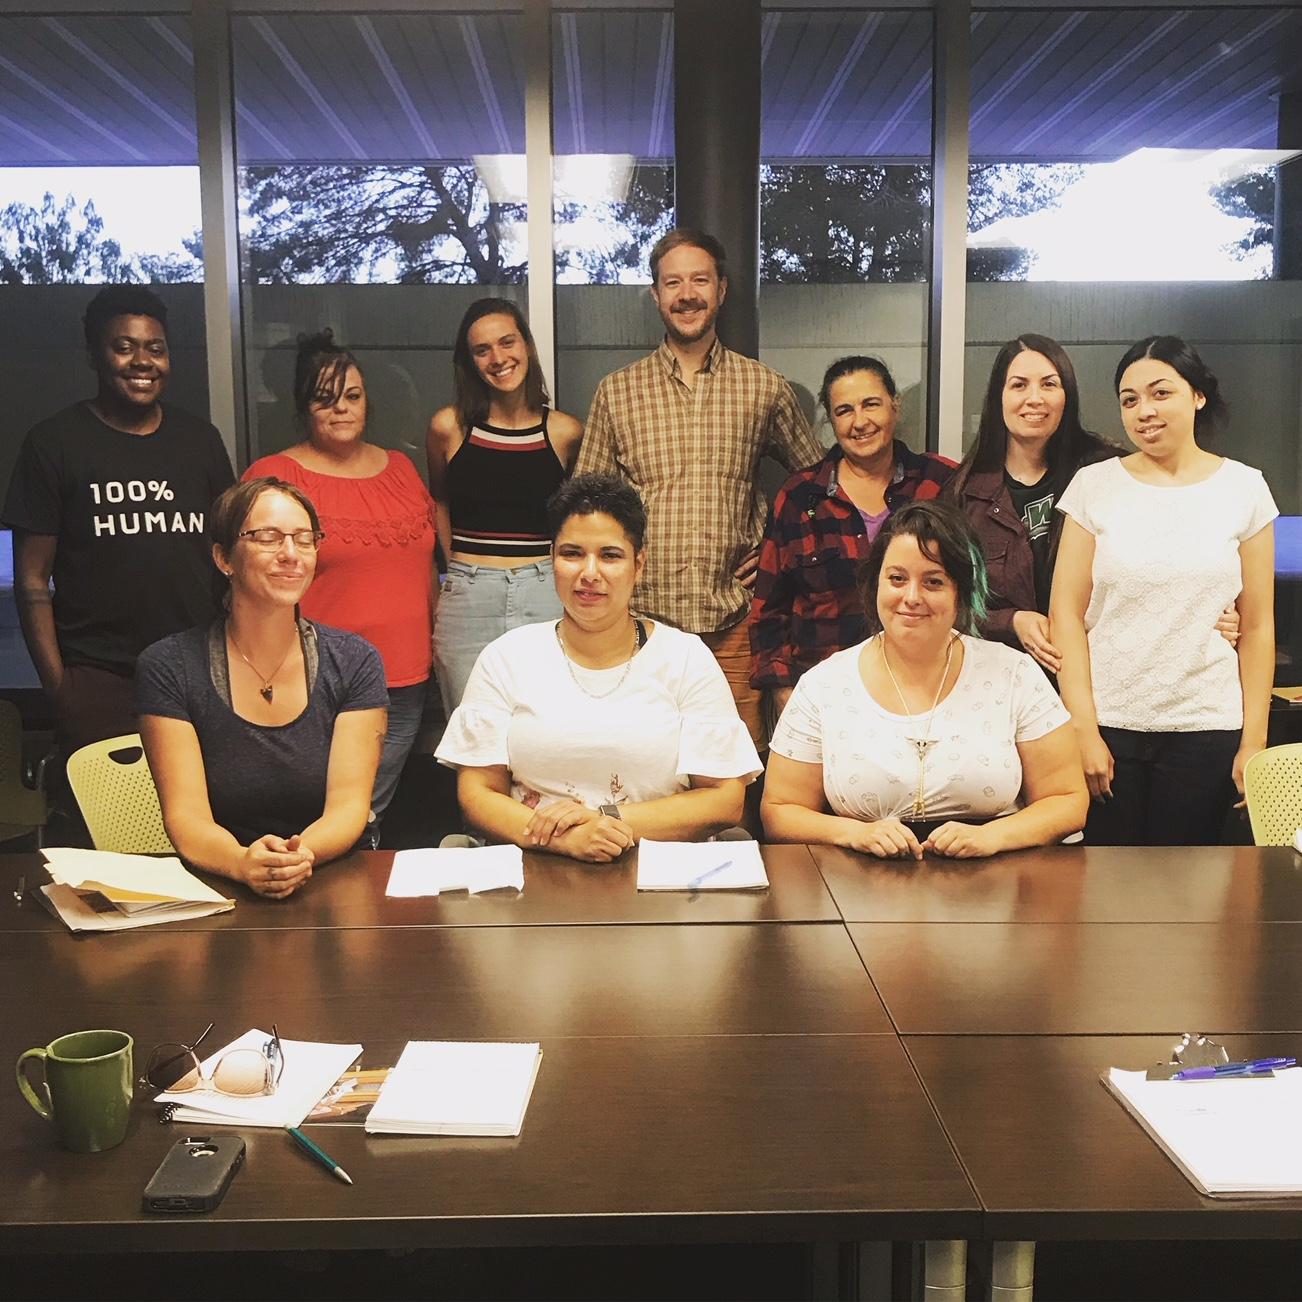 Professional Development Workshop at the University of Arizona Poetry Center